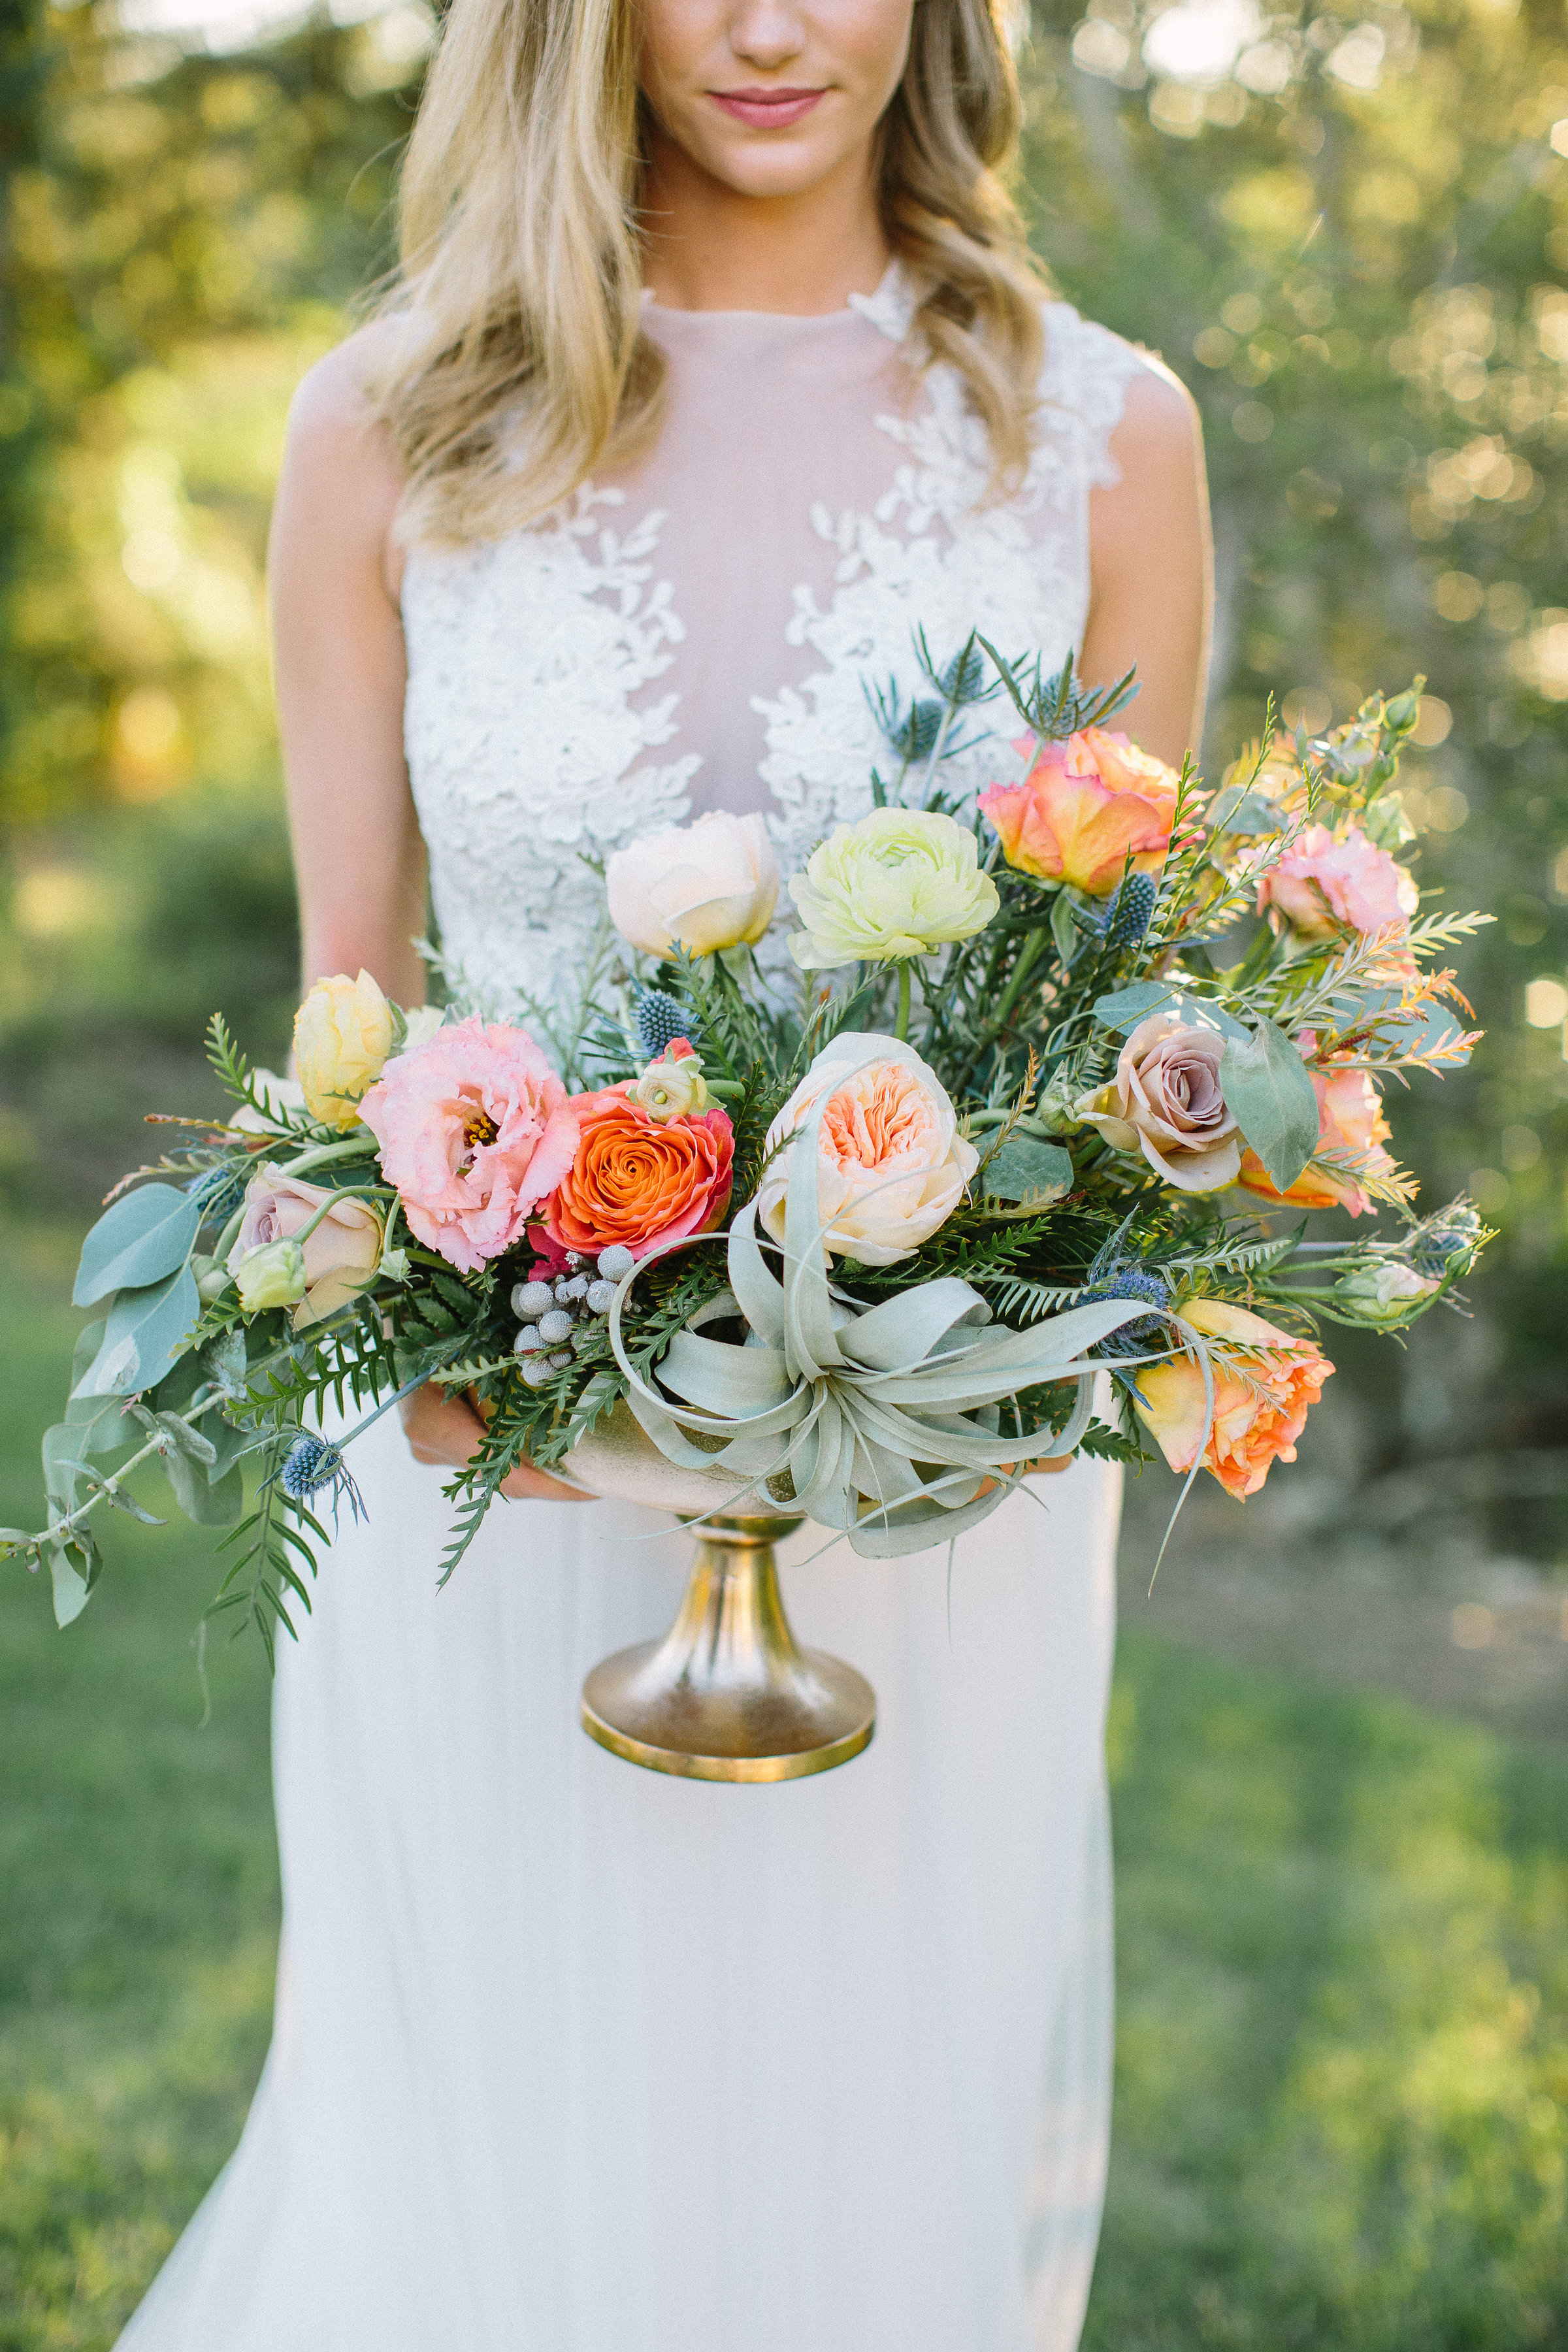 Ellen-Ashton-Photography-Peach-Creek-Ranch-Weddings-Wed-and-Prosper260